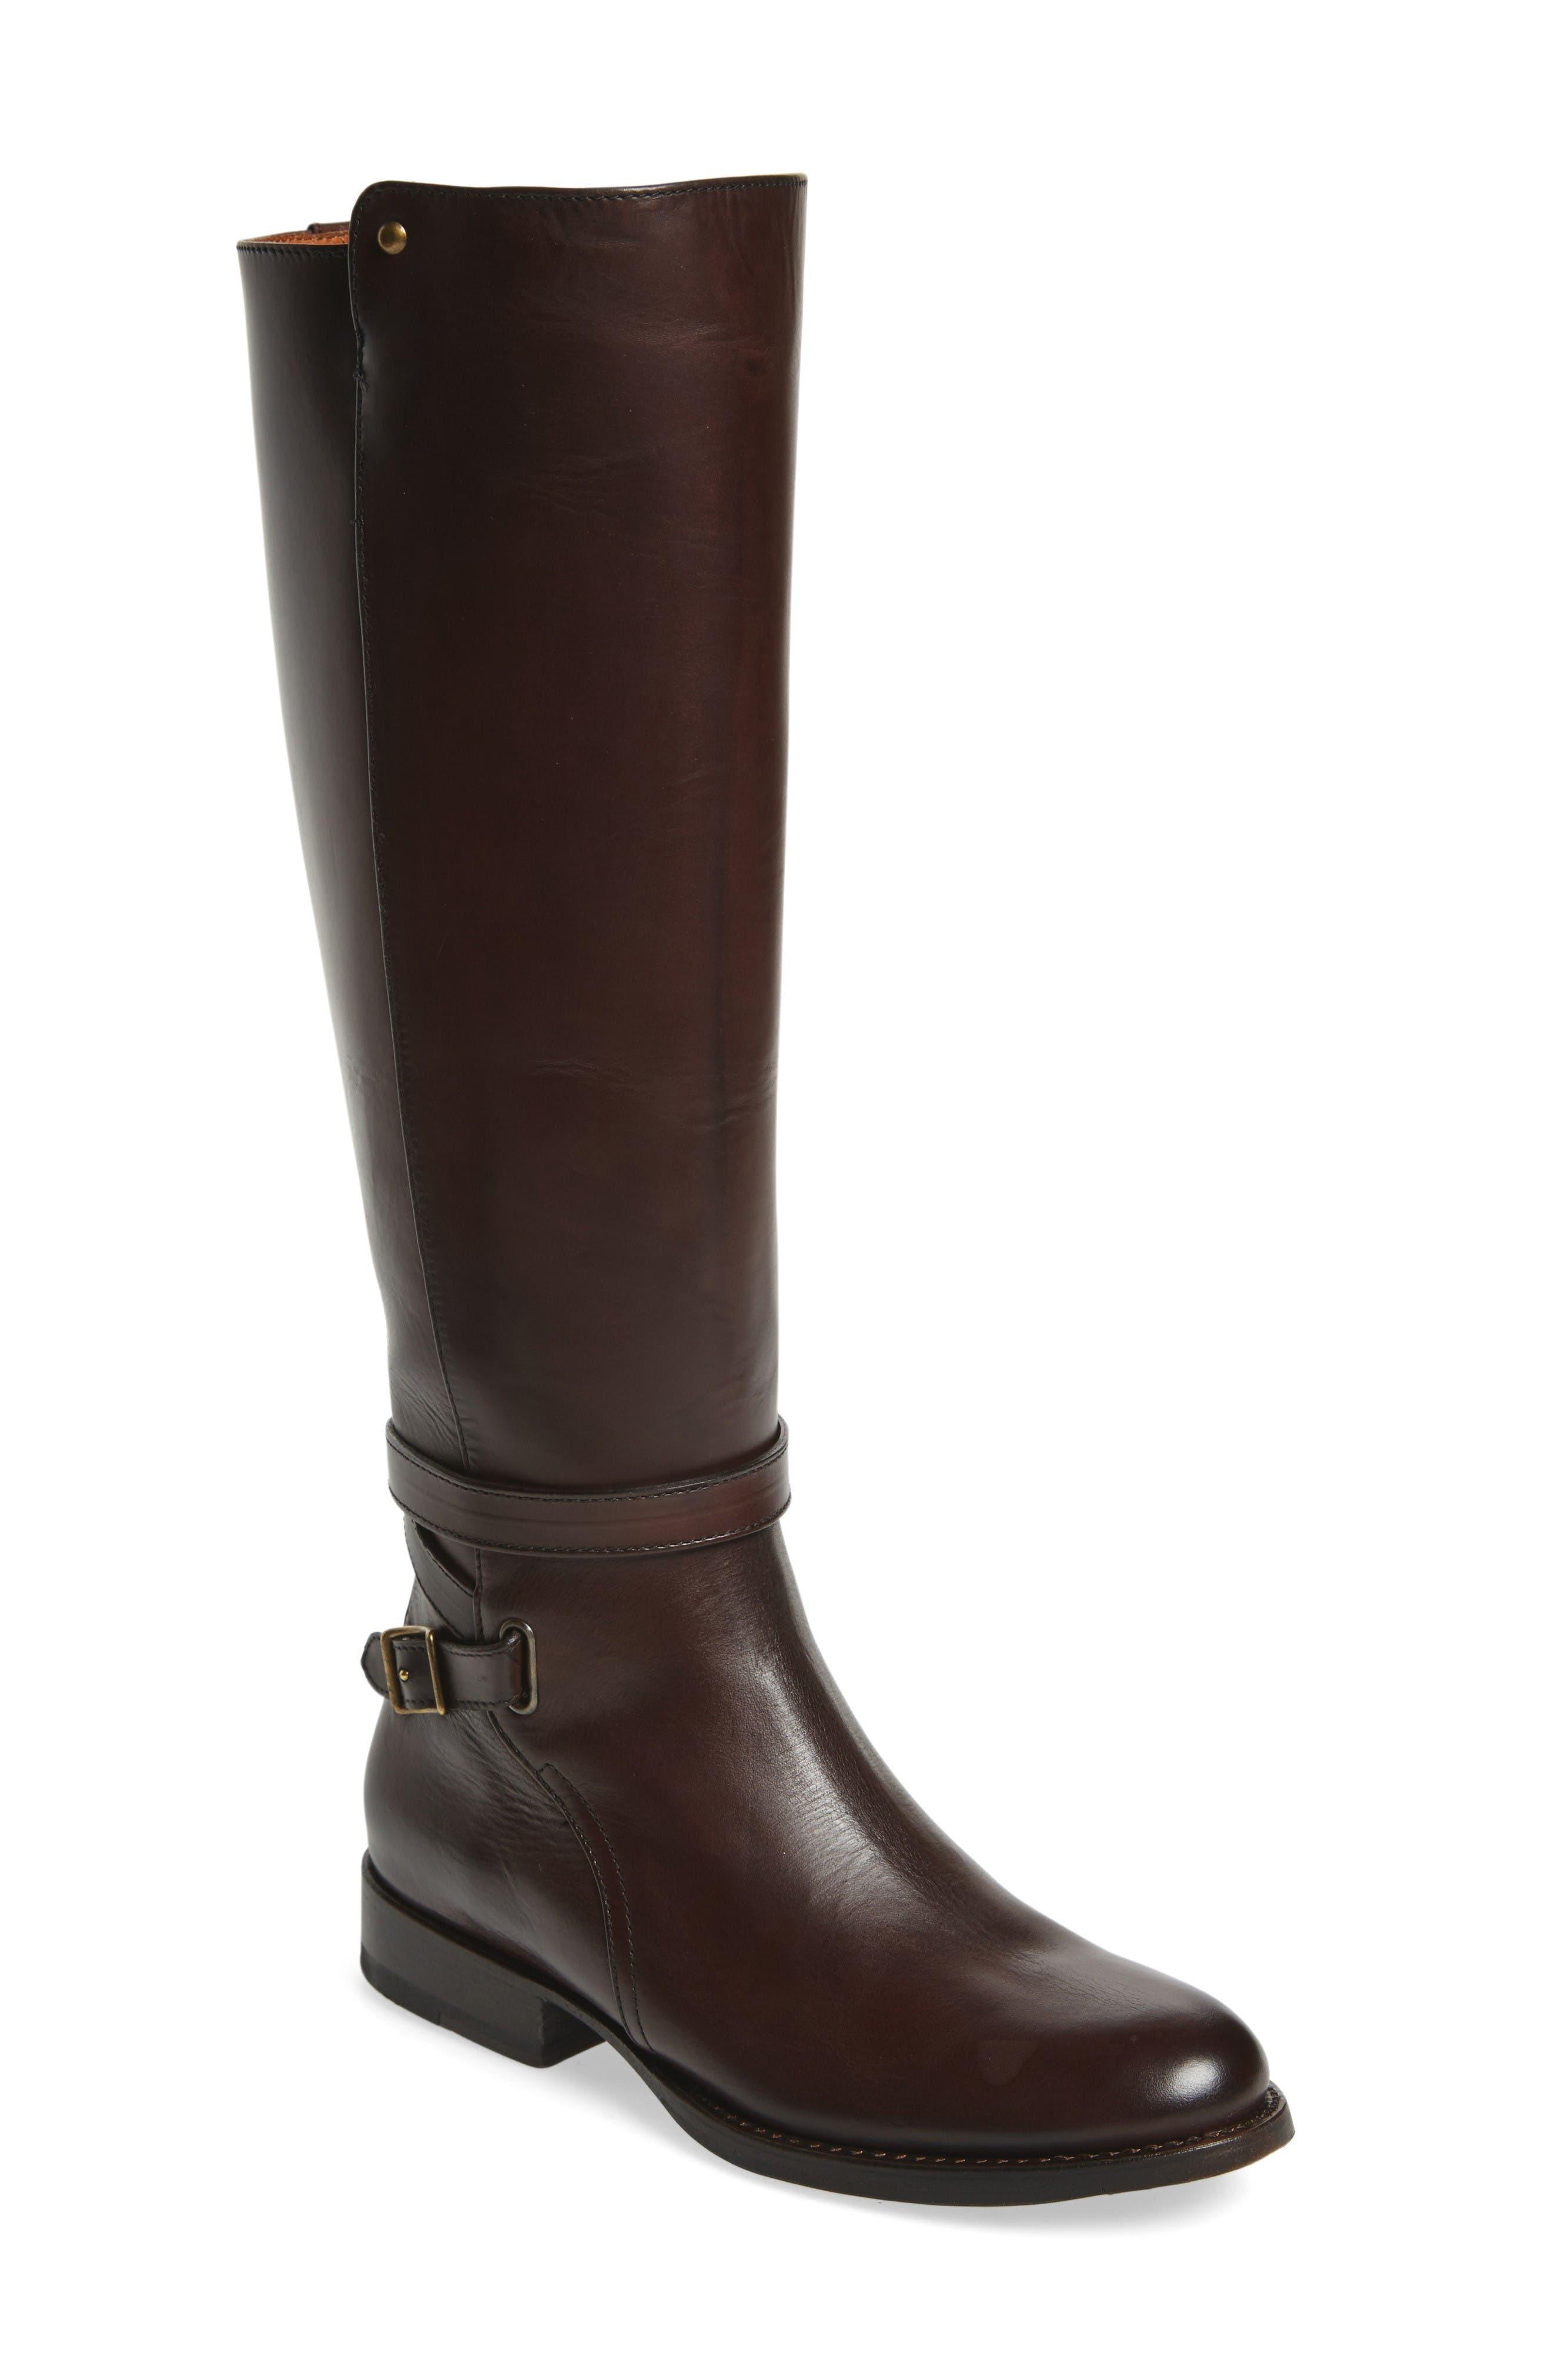 Main Image - Frye Jordan Buckle Strap Knee High Boot (Women)